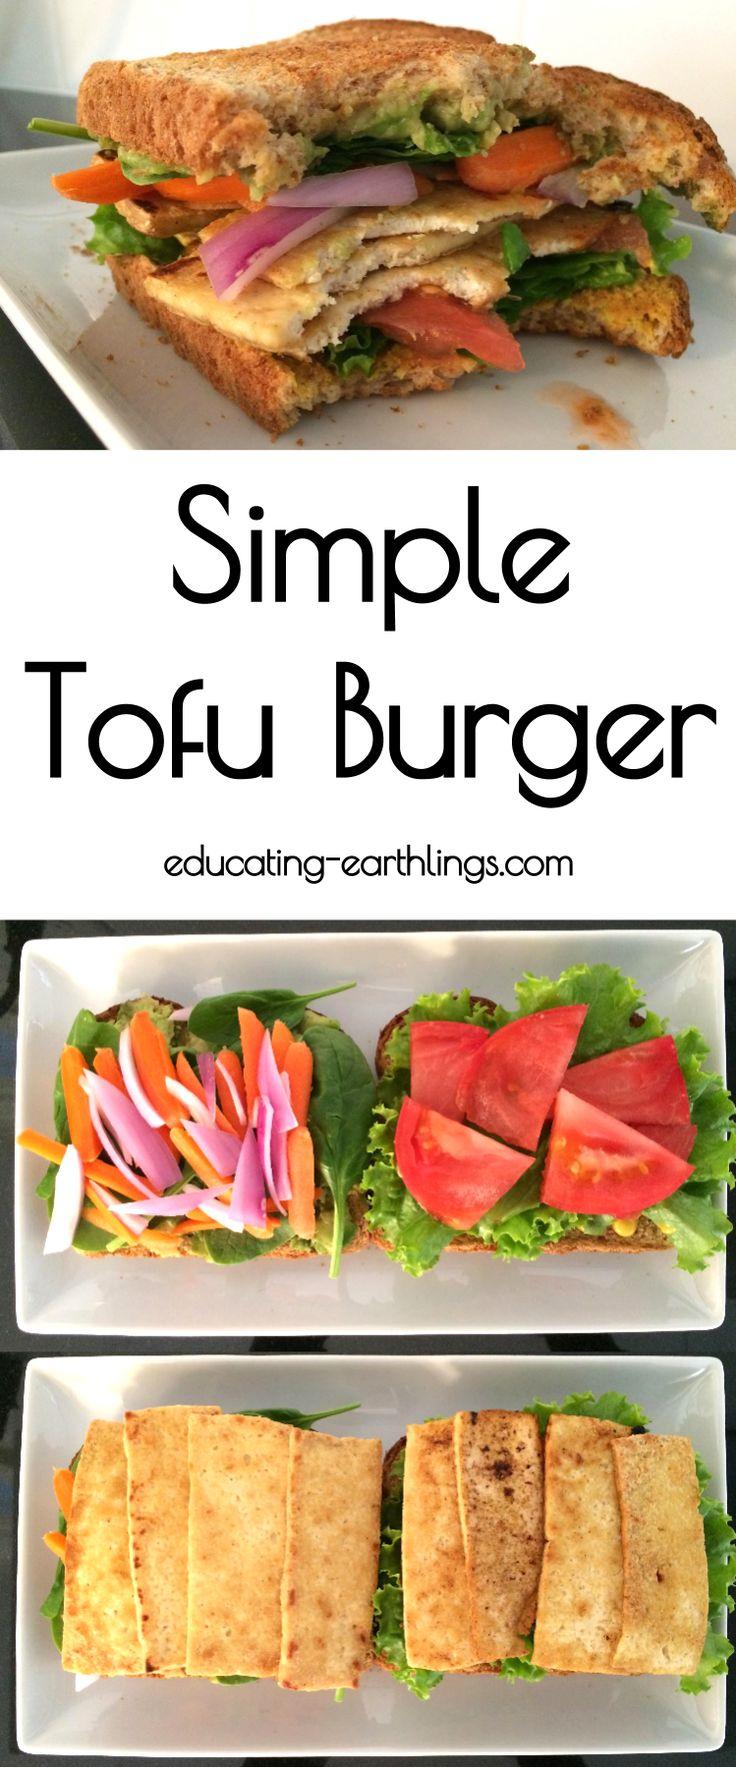 Simple Tofu Burger | Educating Earthlings